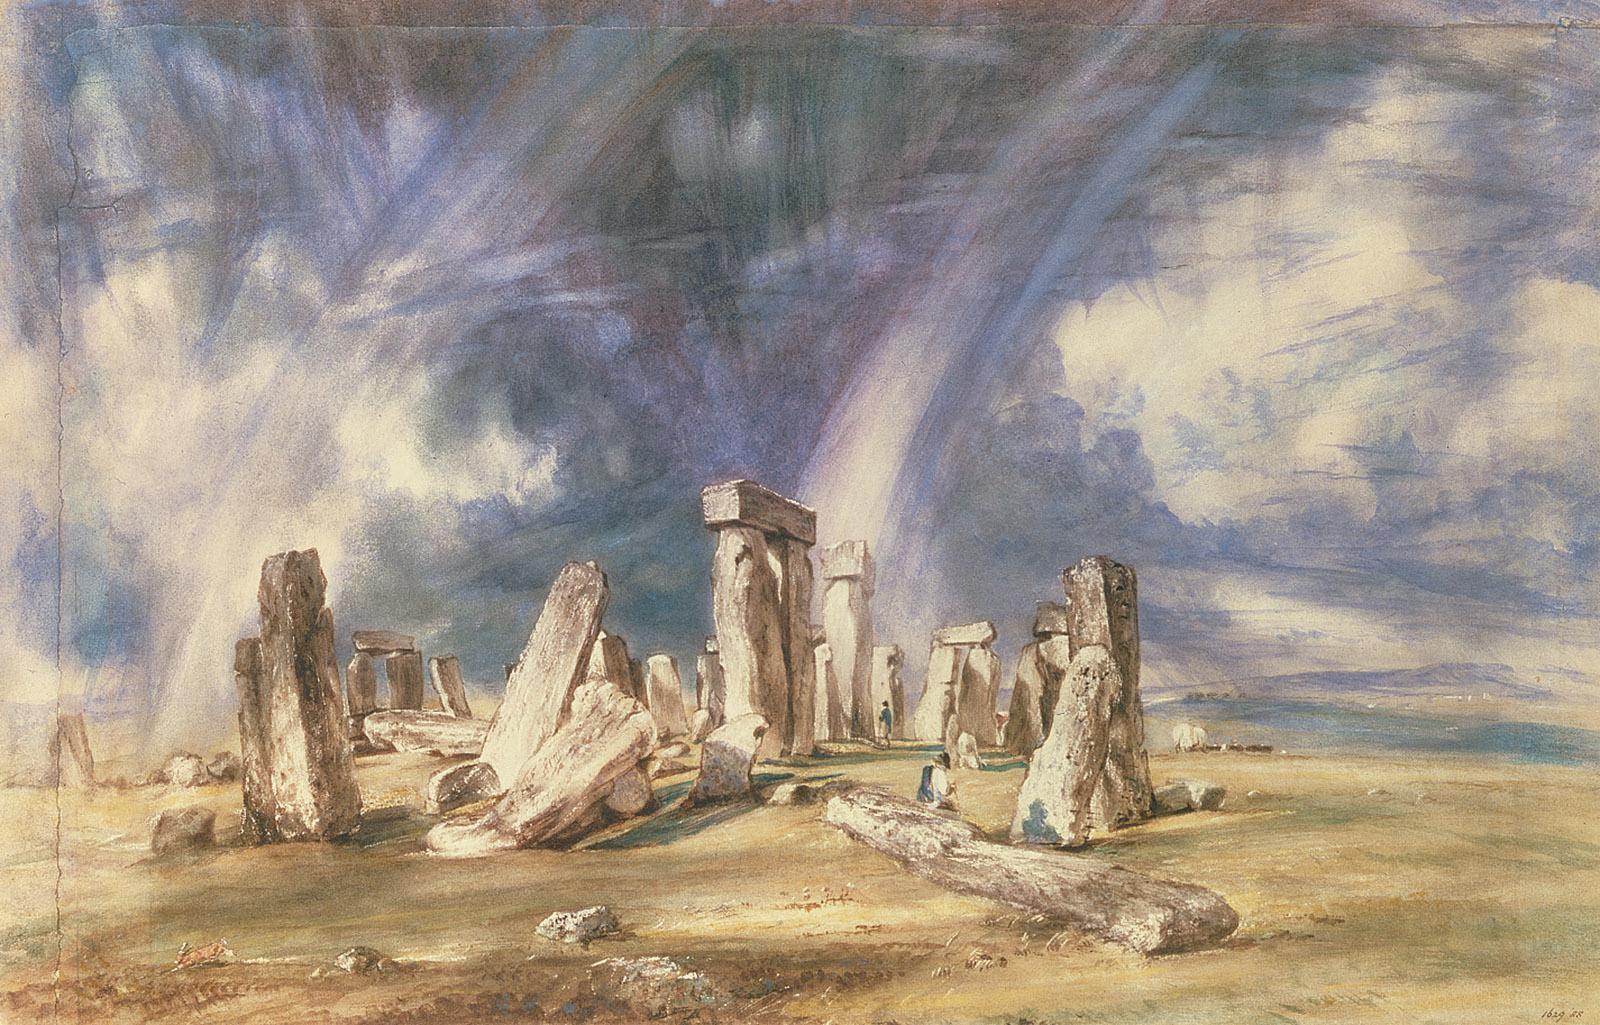 John Constable: Stonehenge, 1835